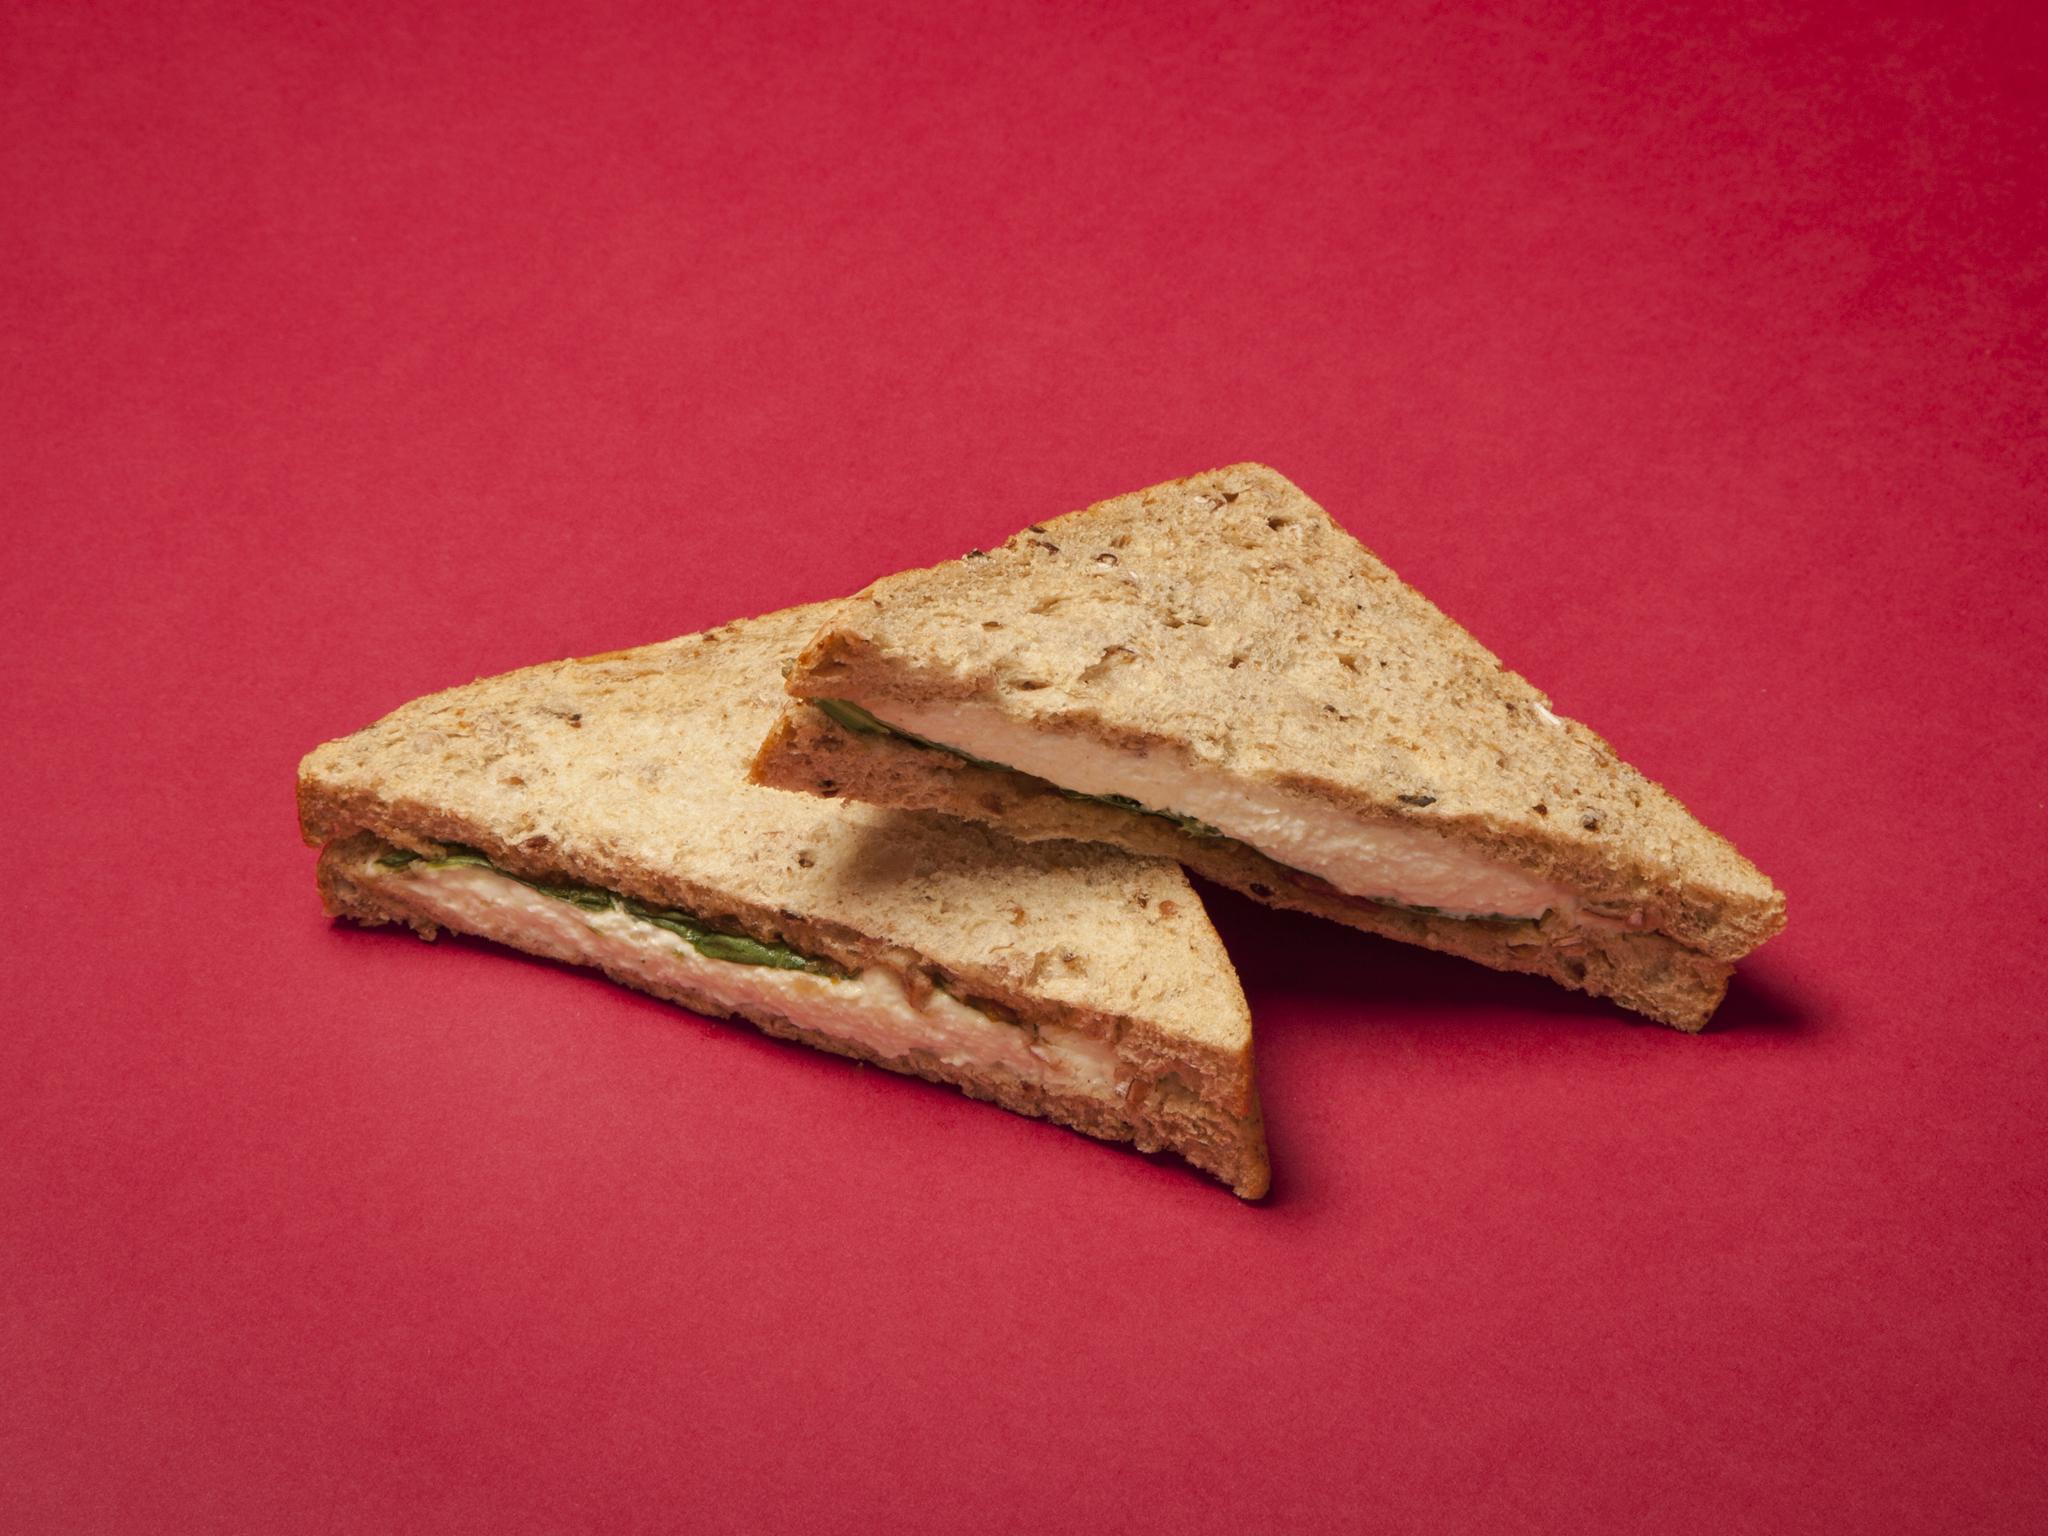 Tesco: Wensleydale and Spiced Carrot Chutney Sandwich